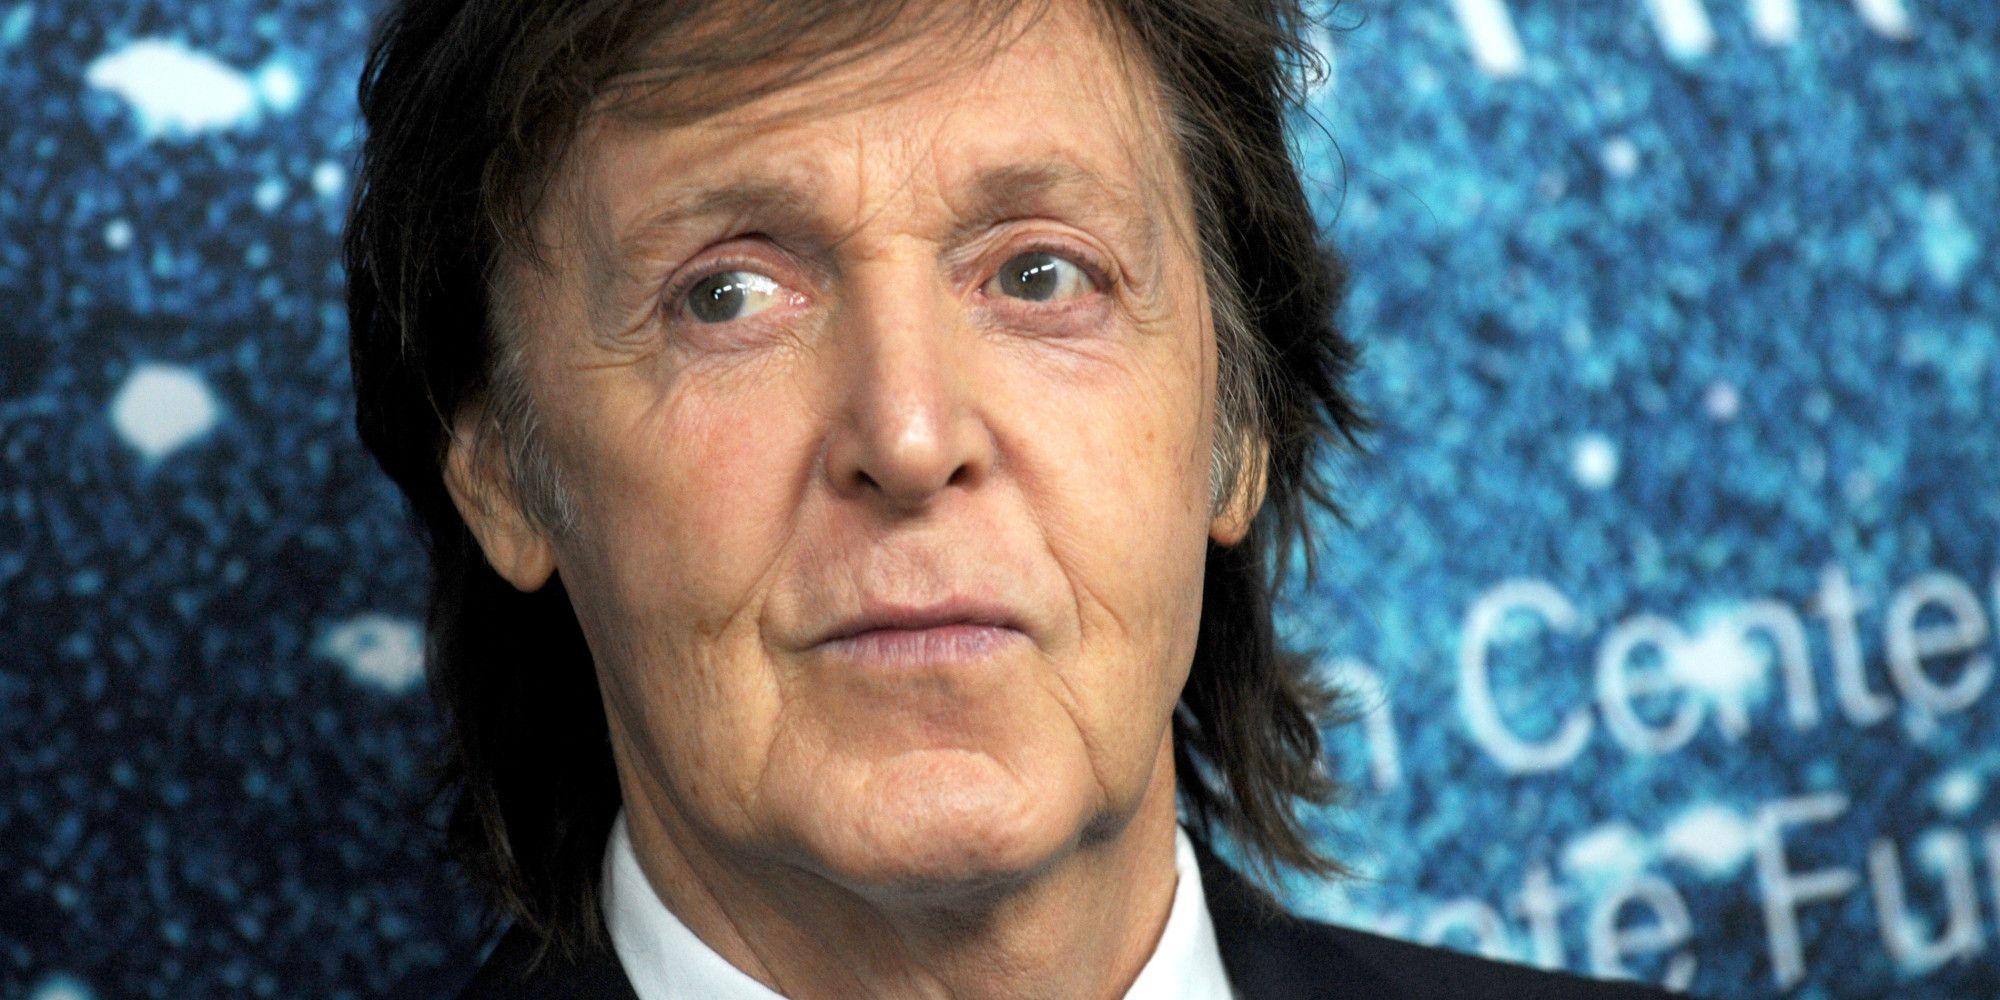 Paul McCartney confesó: Cuando era niño, era racista